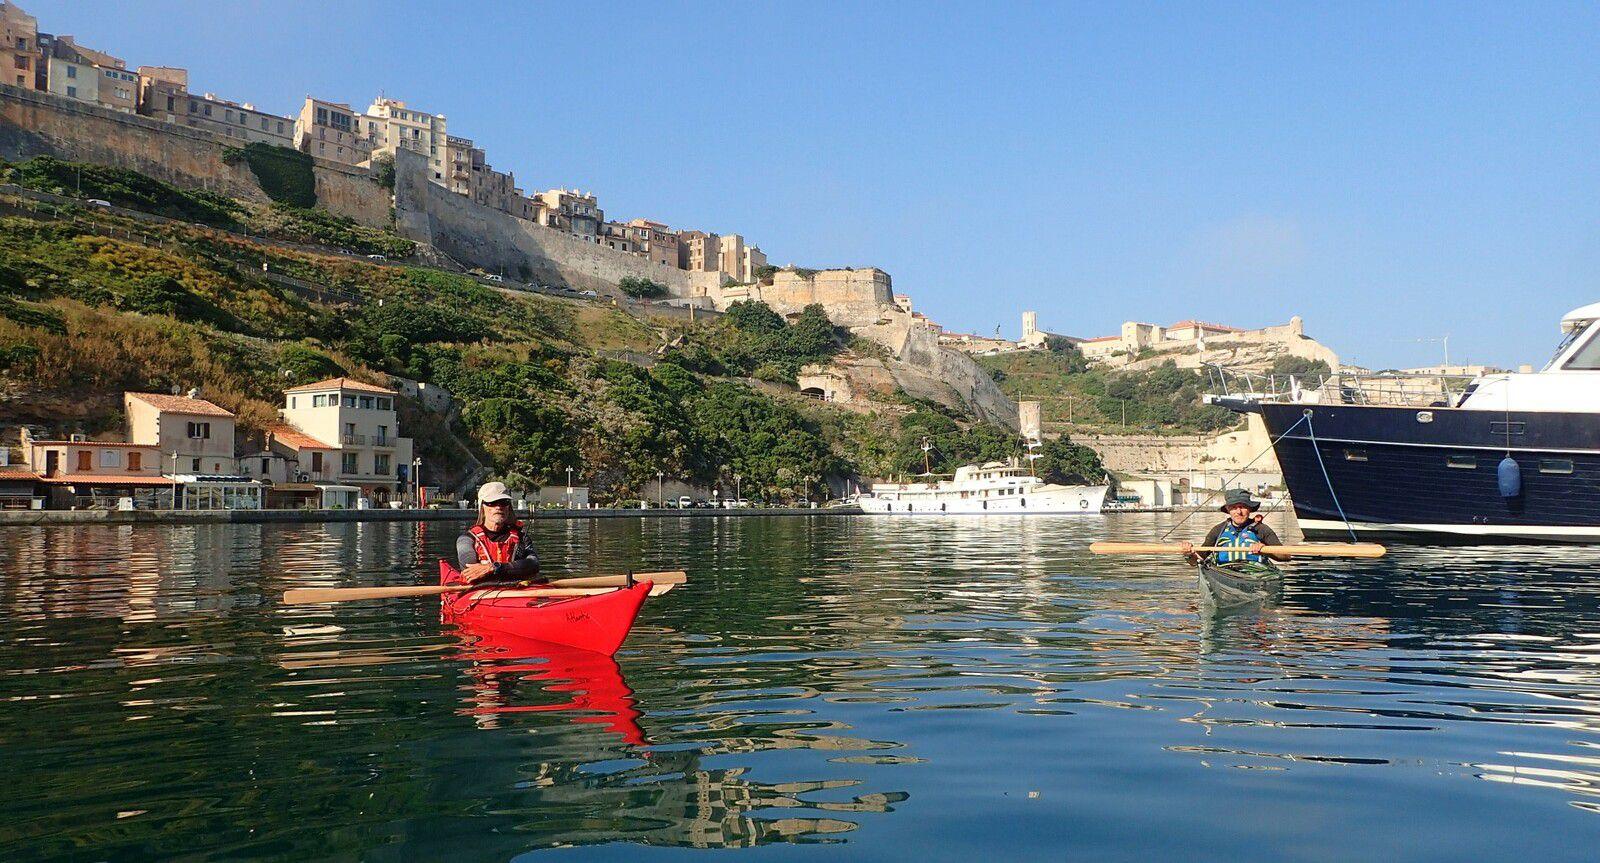 Corsica 2021, la beauté, essentielle, de la nature - Chapitre 15 : De Bonifacio à Piantarella